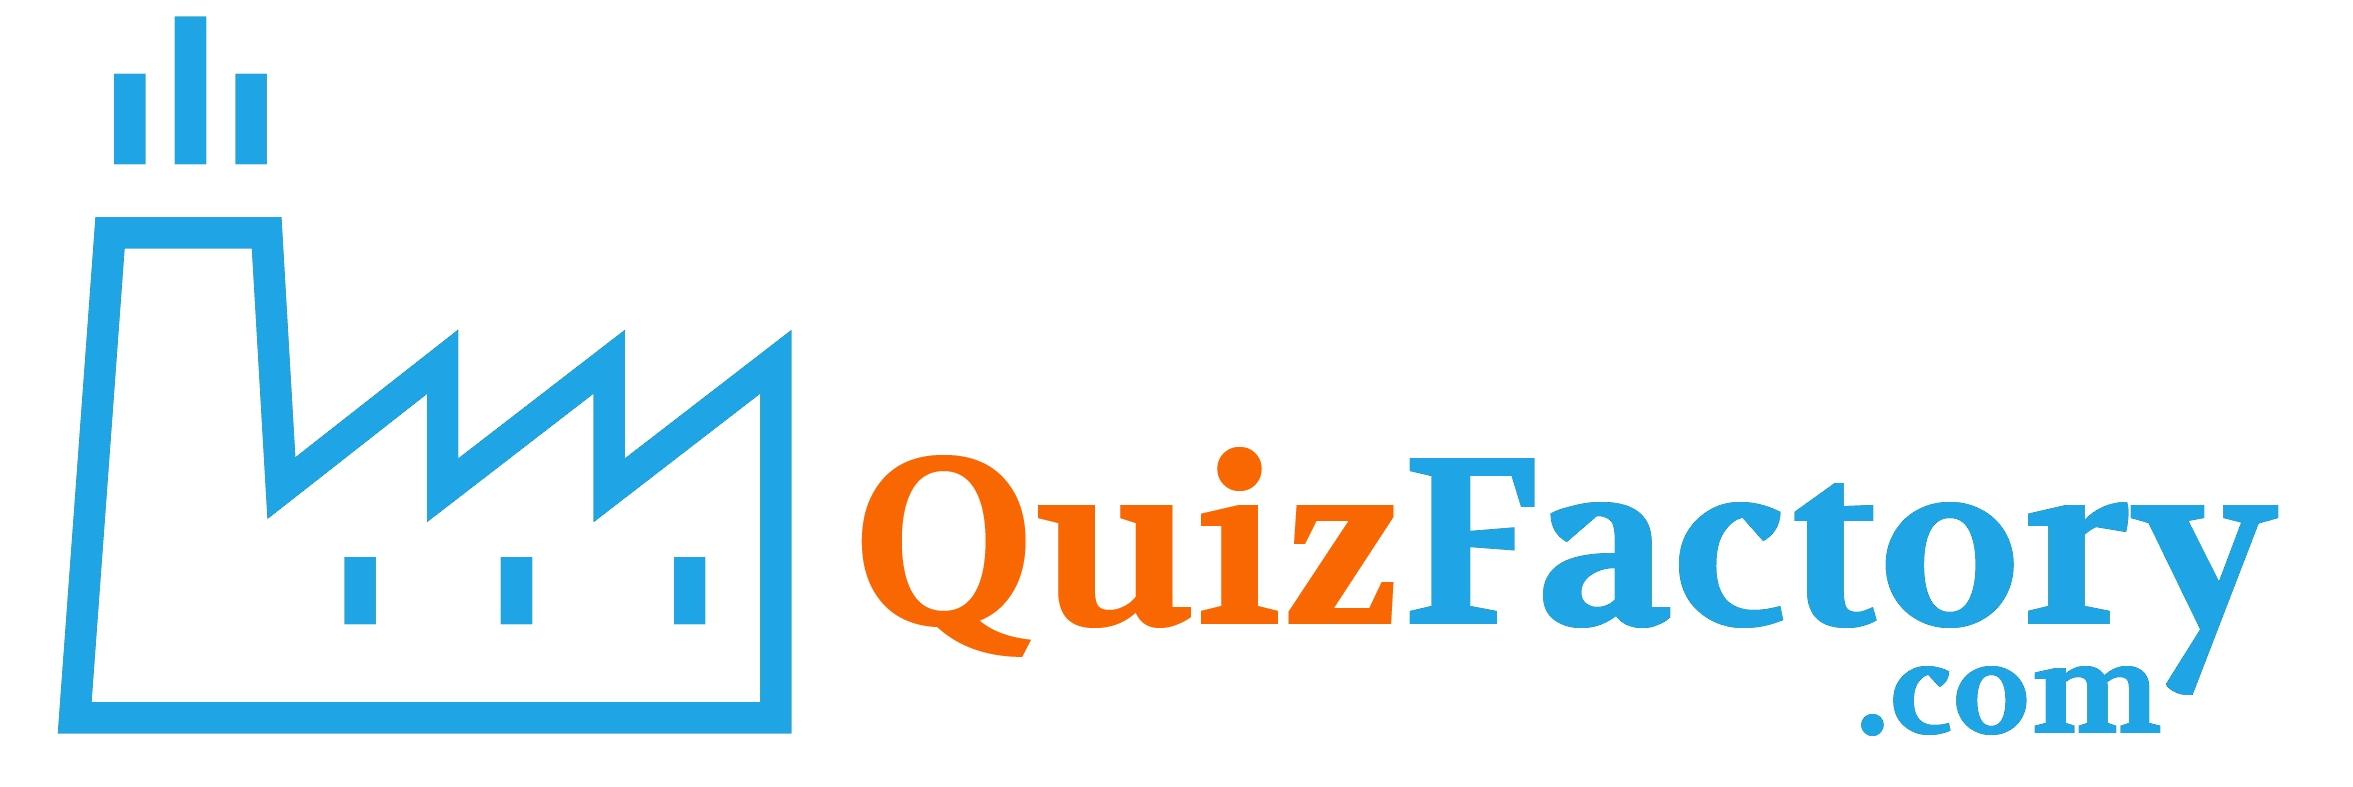 Quizfactory - Fun Quizzes